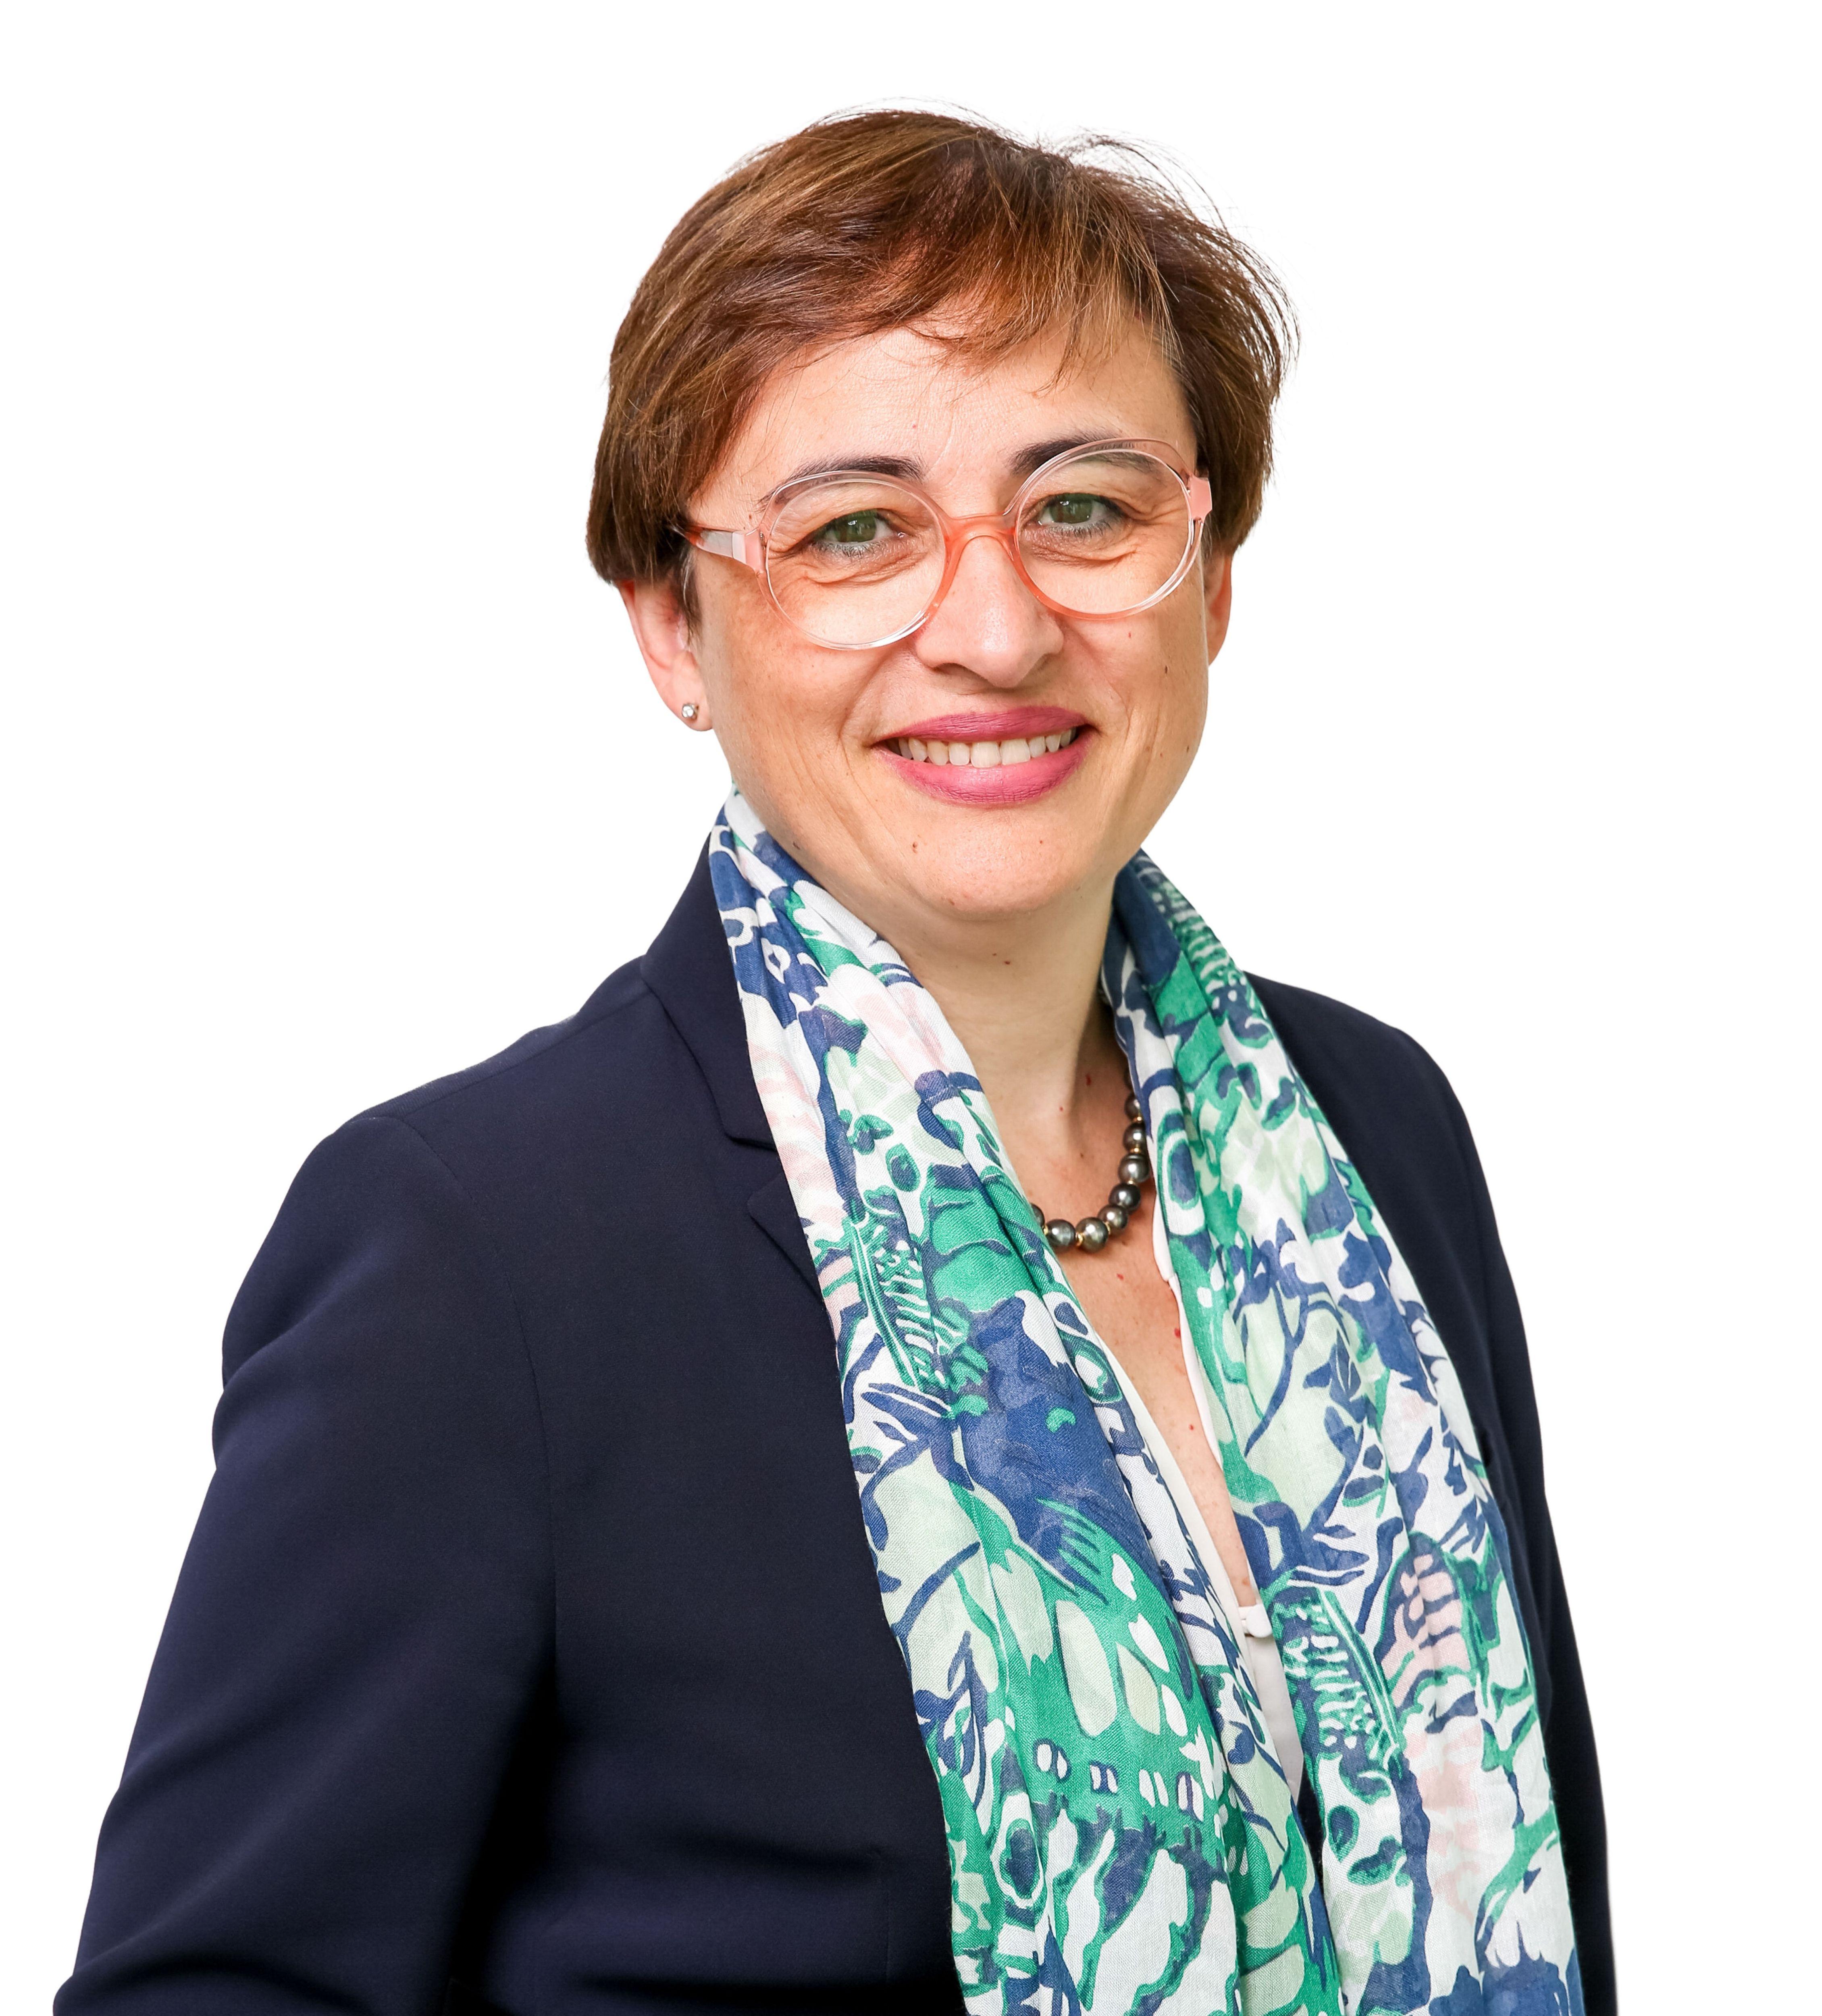 Nathalie Charles